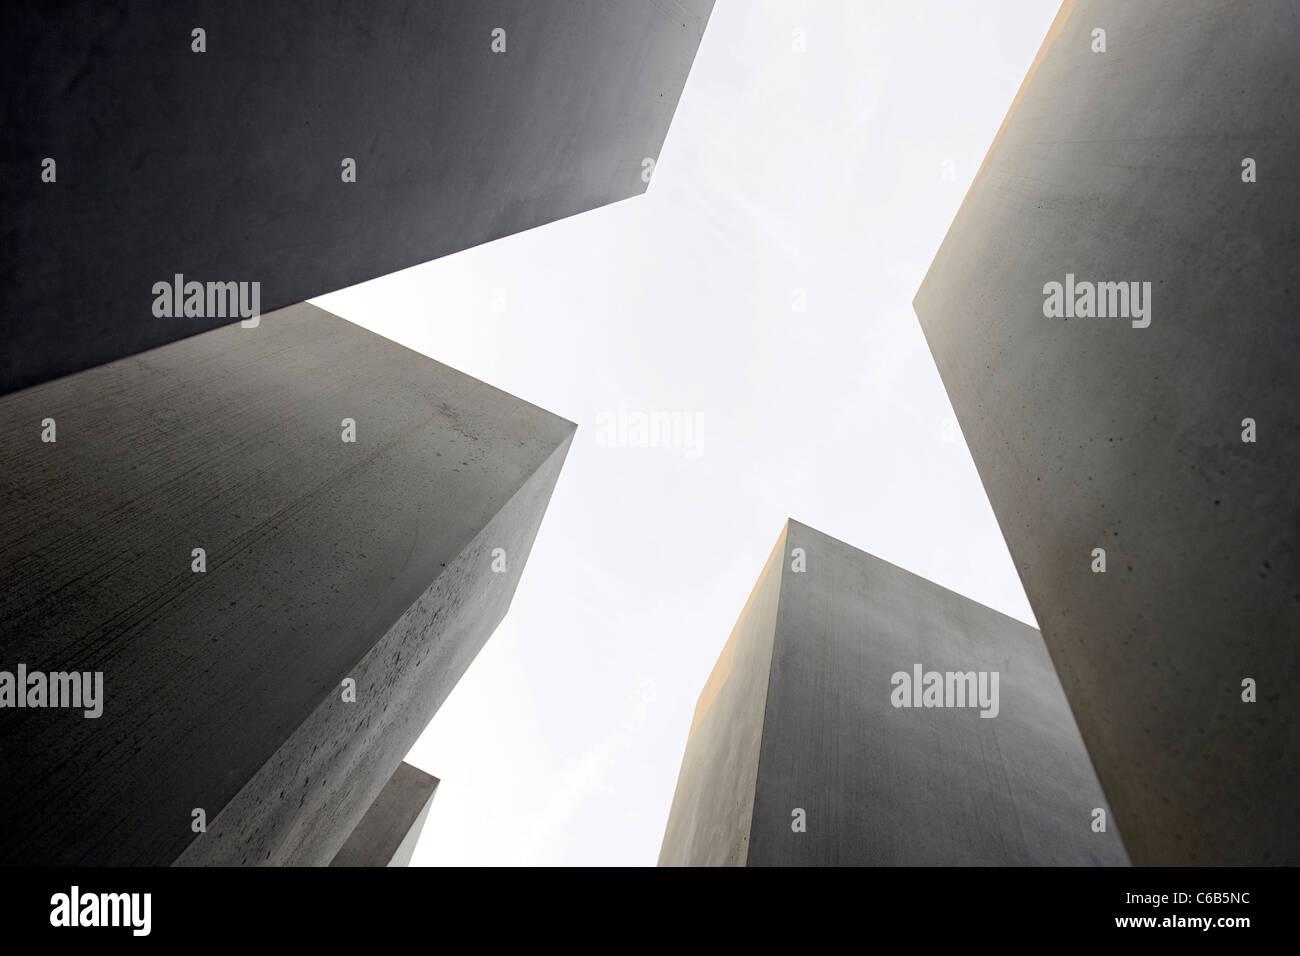 Concrete pillars of the Holocaust memorial, memorial, architect Peter Eisenman, Tiergarten, Mitte district, Berlin, Stock Photo